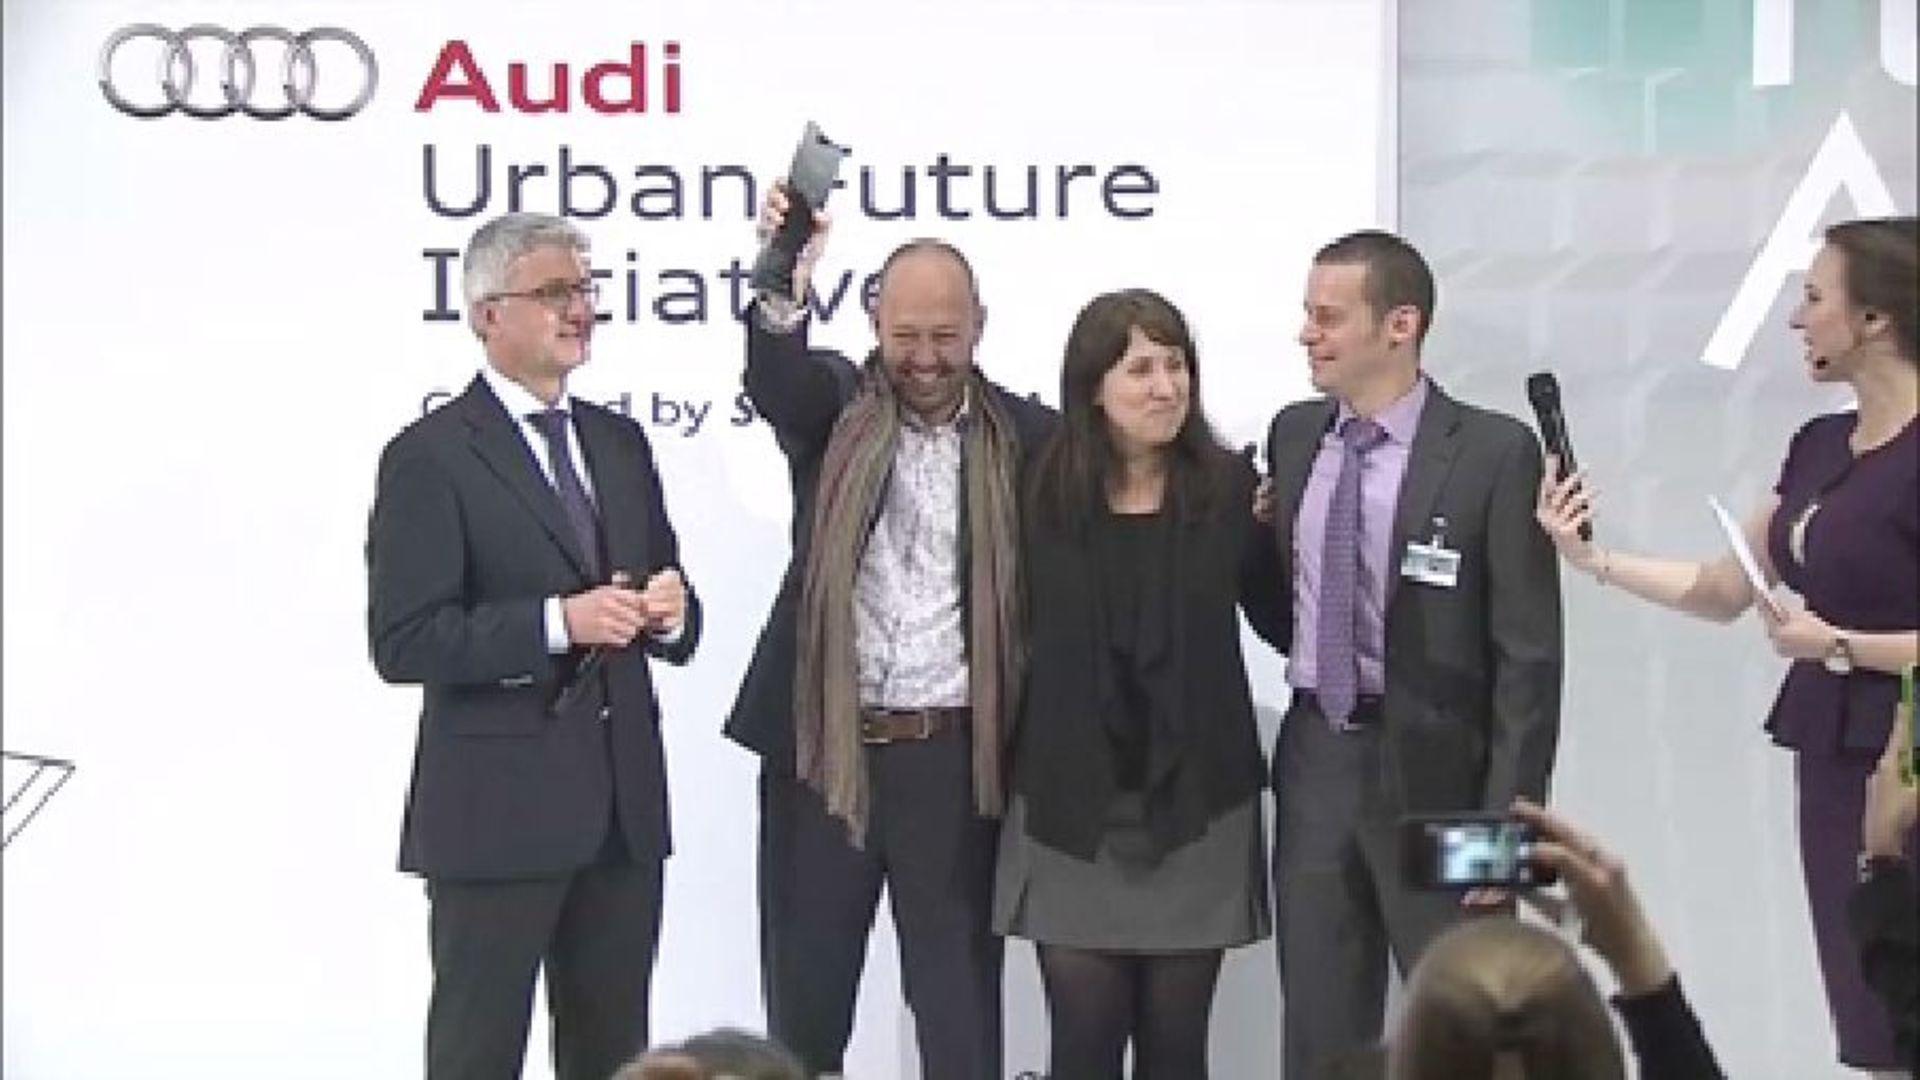 Audi Urban Future Award - The Award Ceremony